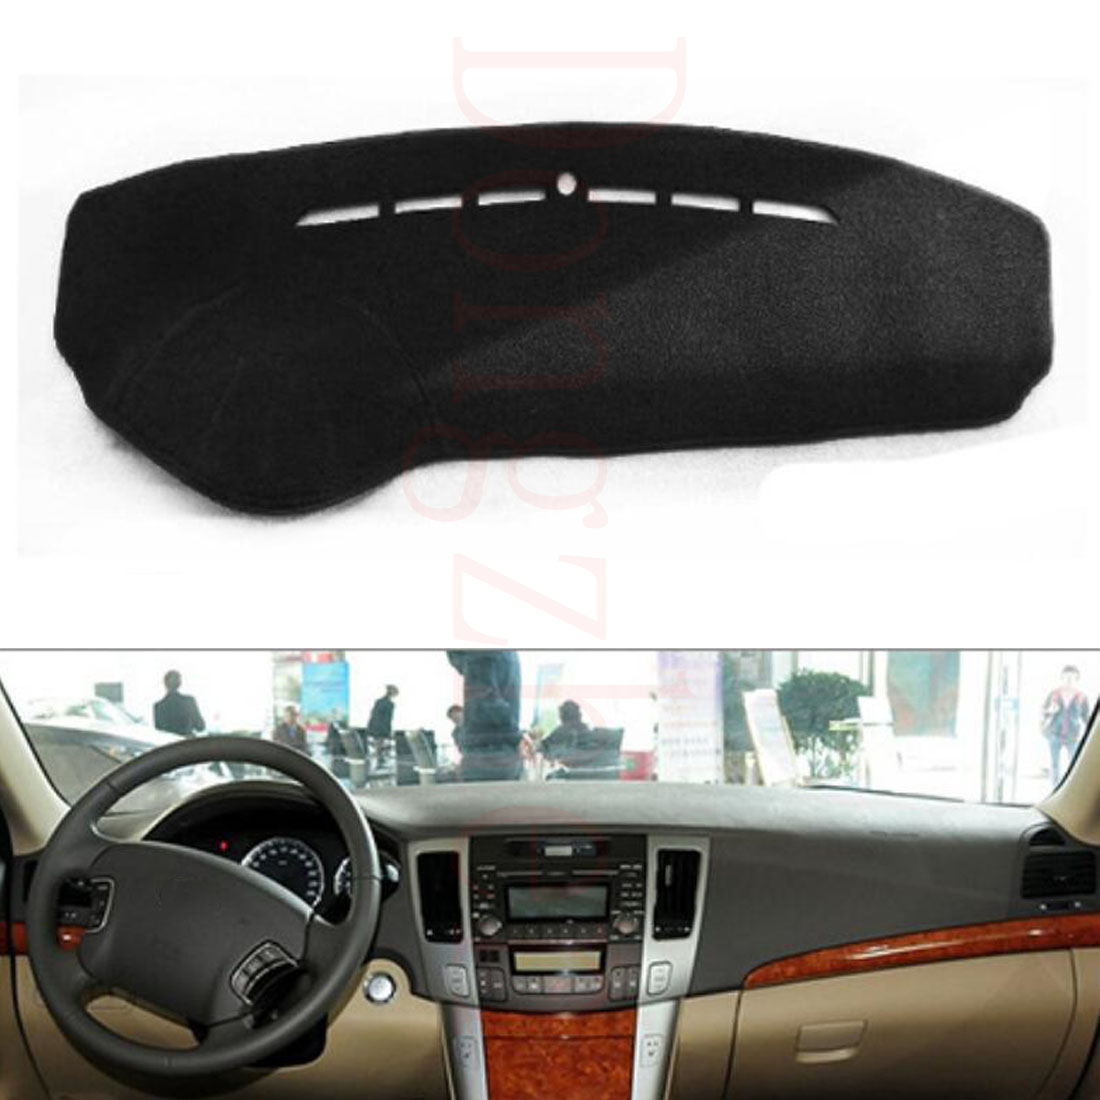 New Hyundai Sonata >> Dongzhen Fit For HYUNDAI SONATA NF 2009 Car Dashboard Cover Avoid Light Pad Instrument Platform ...